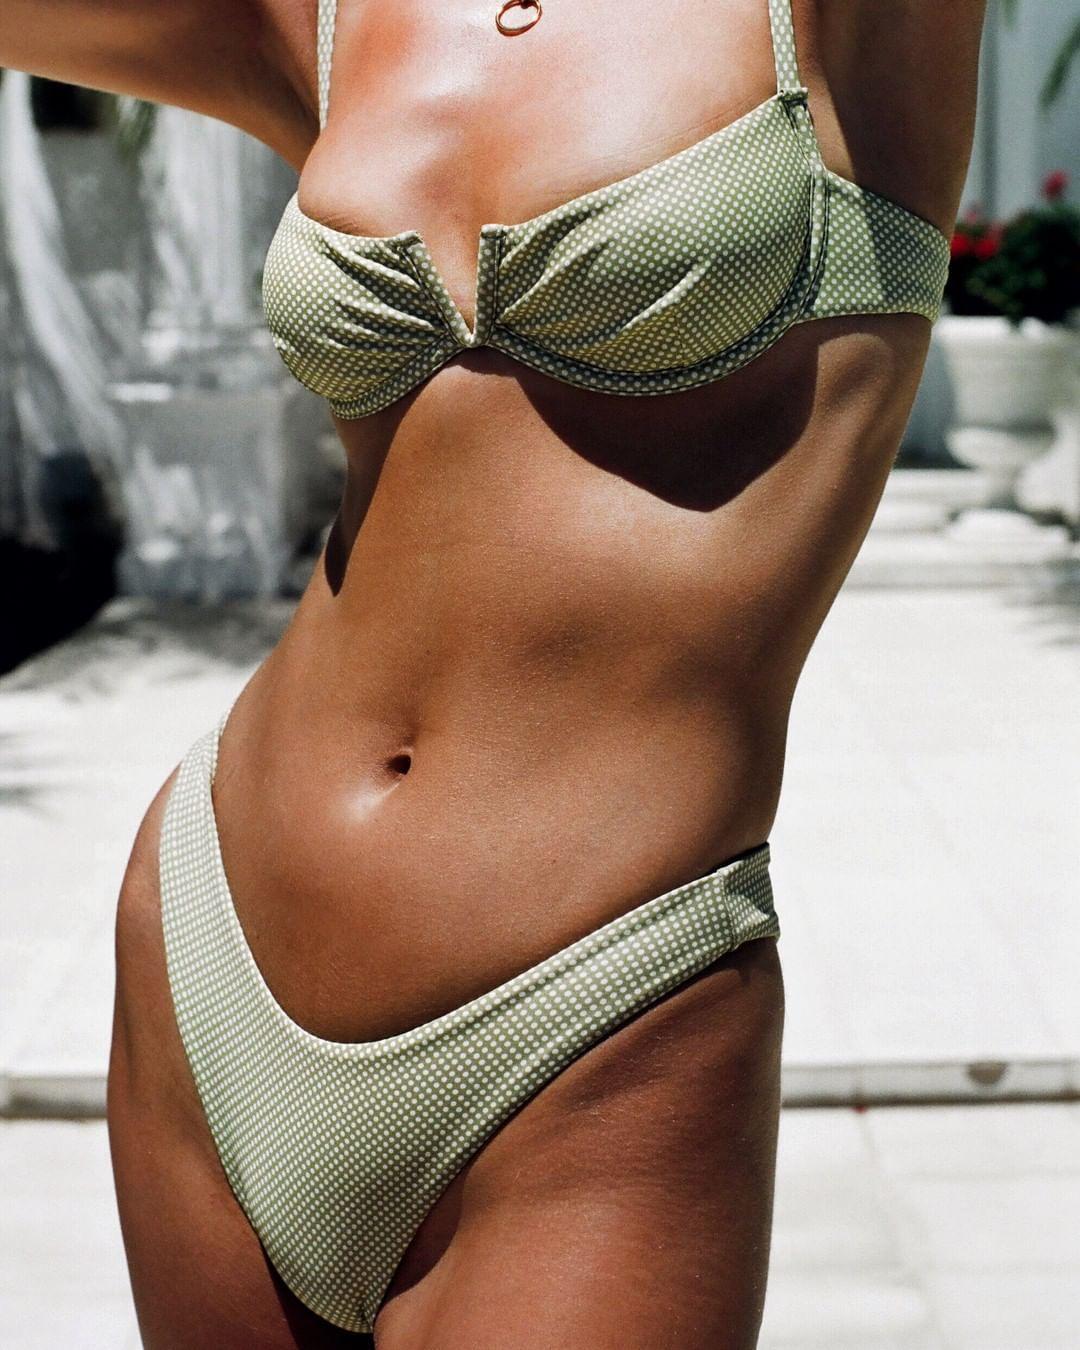 Hirigin 2020 Printed Bikini Women Push Up Padded Cute Thong Bikini Set Swimwear Women Bathing Suit Summer Beach Simming Biquini